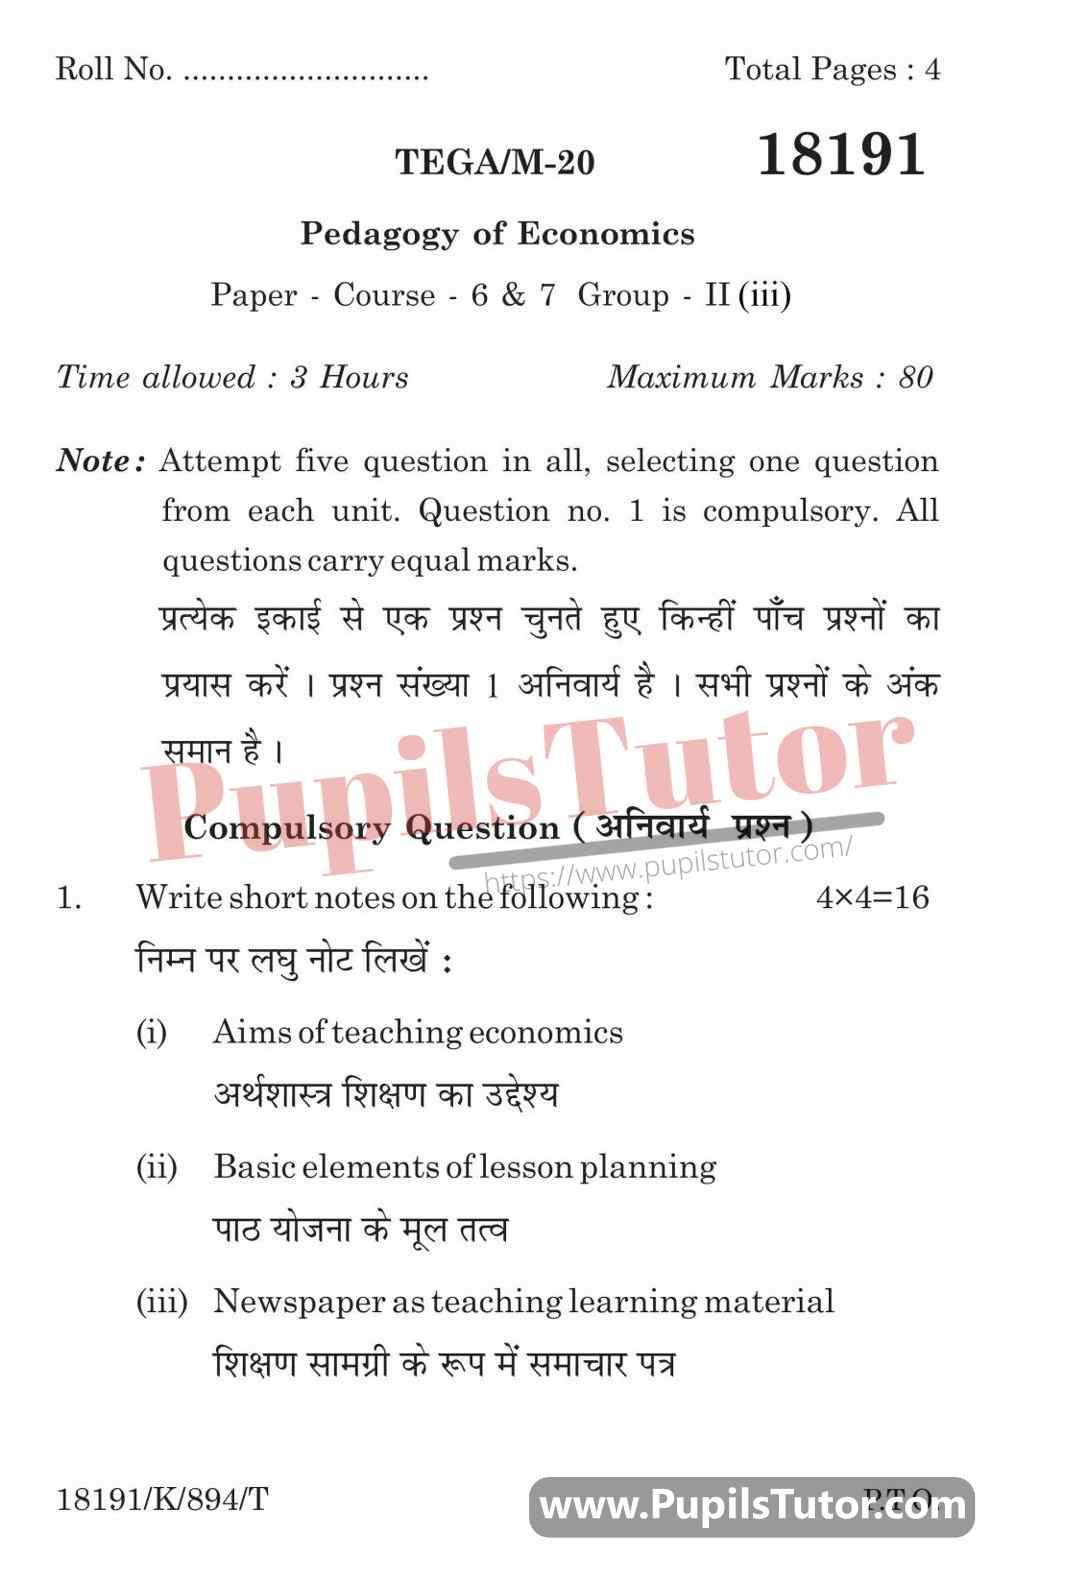 KUK (Kurukshetra University, Haryana) Pedagogy Of Economics Question Paper 2020 For B.Ed 1st And 2nd Year And All The 4 Semesters In English And Hindi Medium Free Download PDF - Page 1 - Pupils Tutor